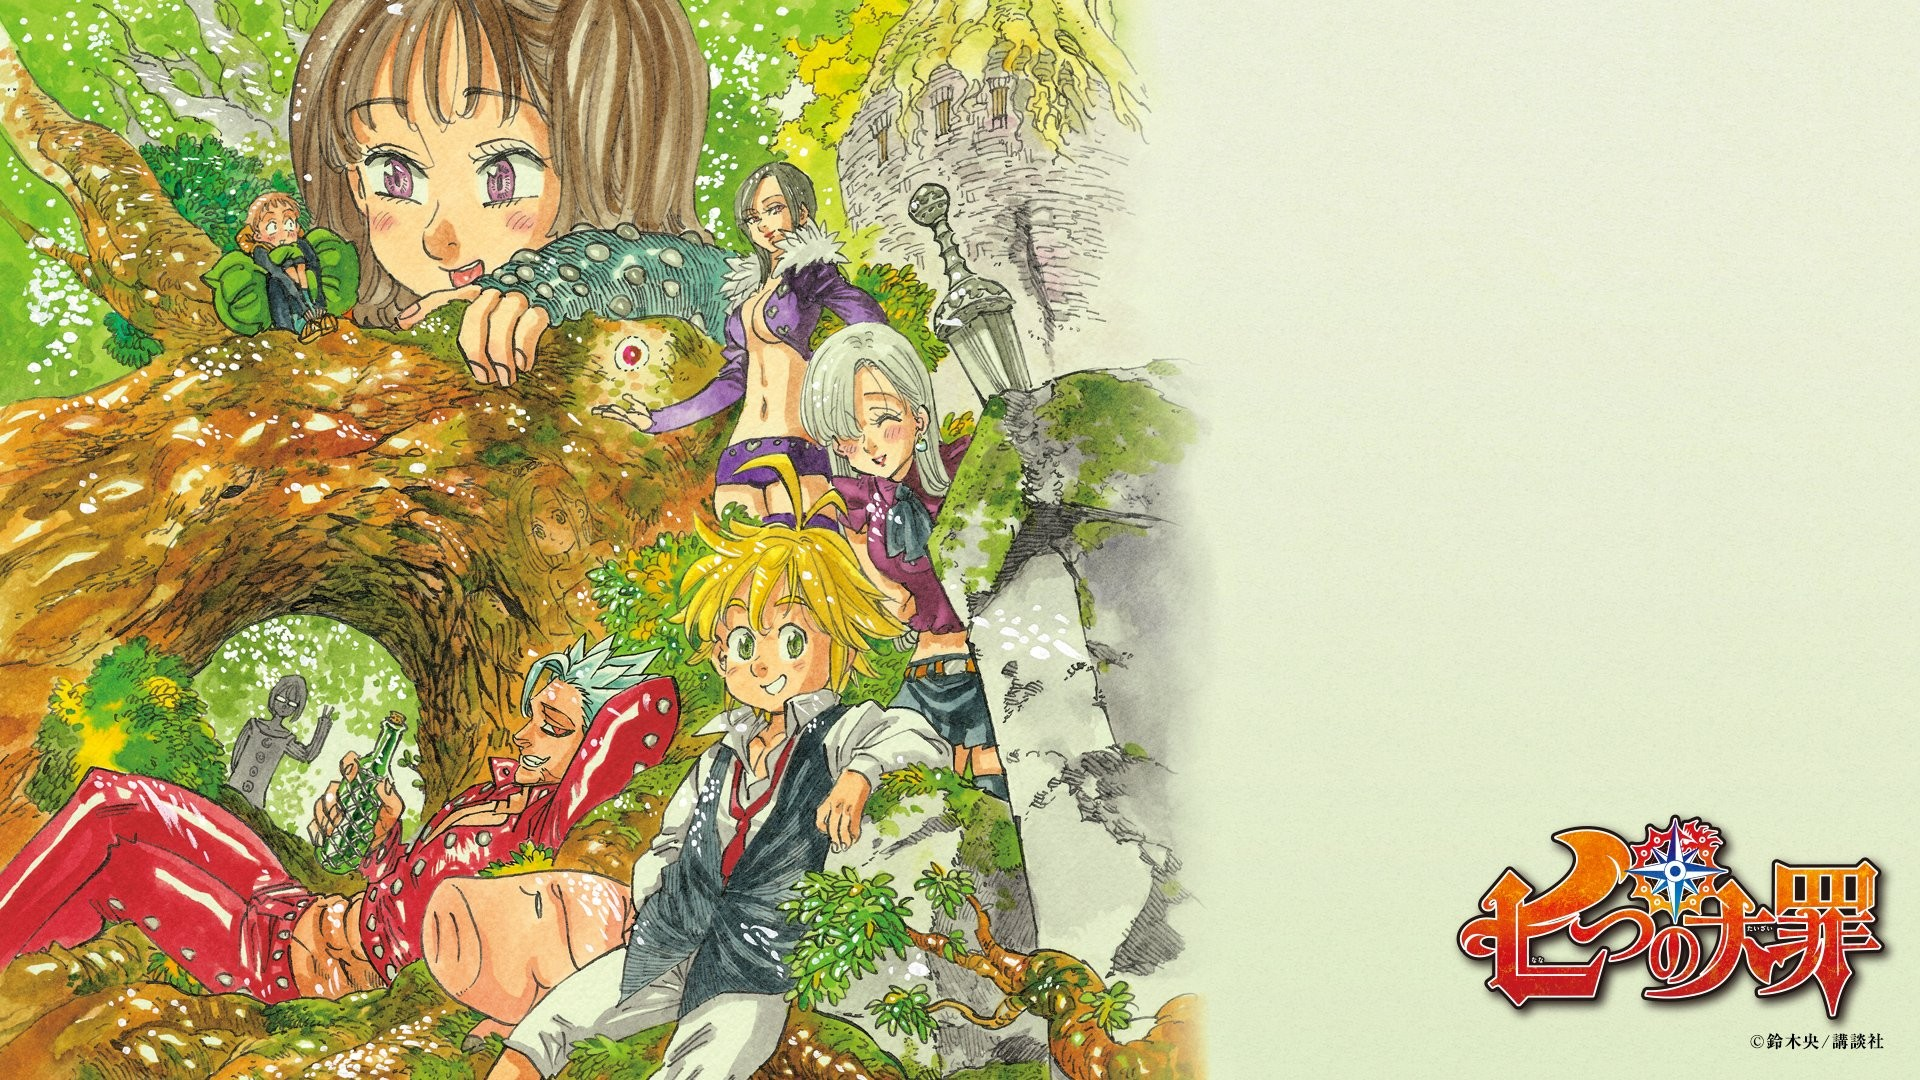 Seven Deadly Sins Anime wallpaper ·① Download free ...